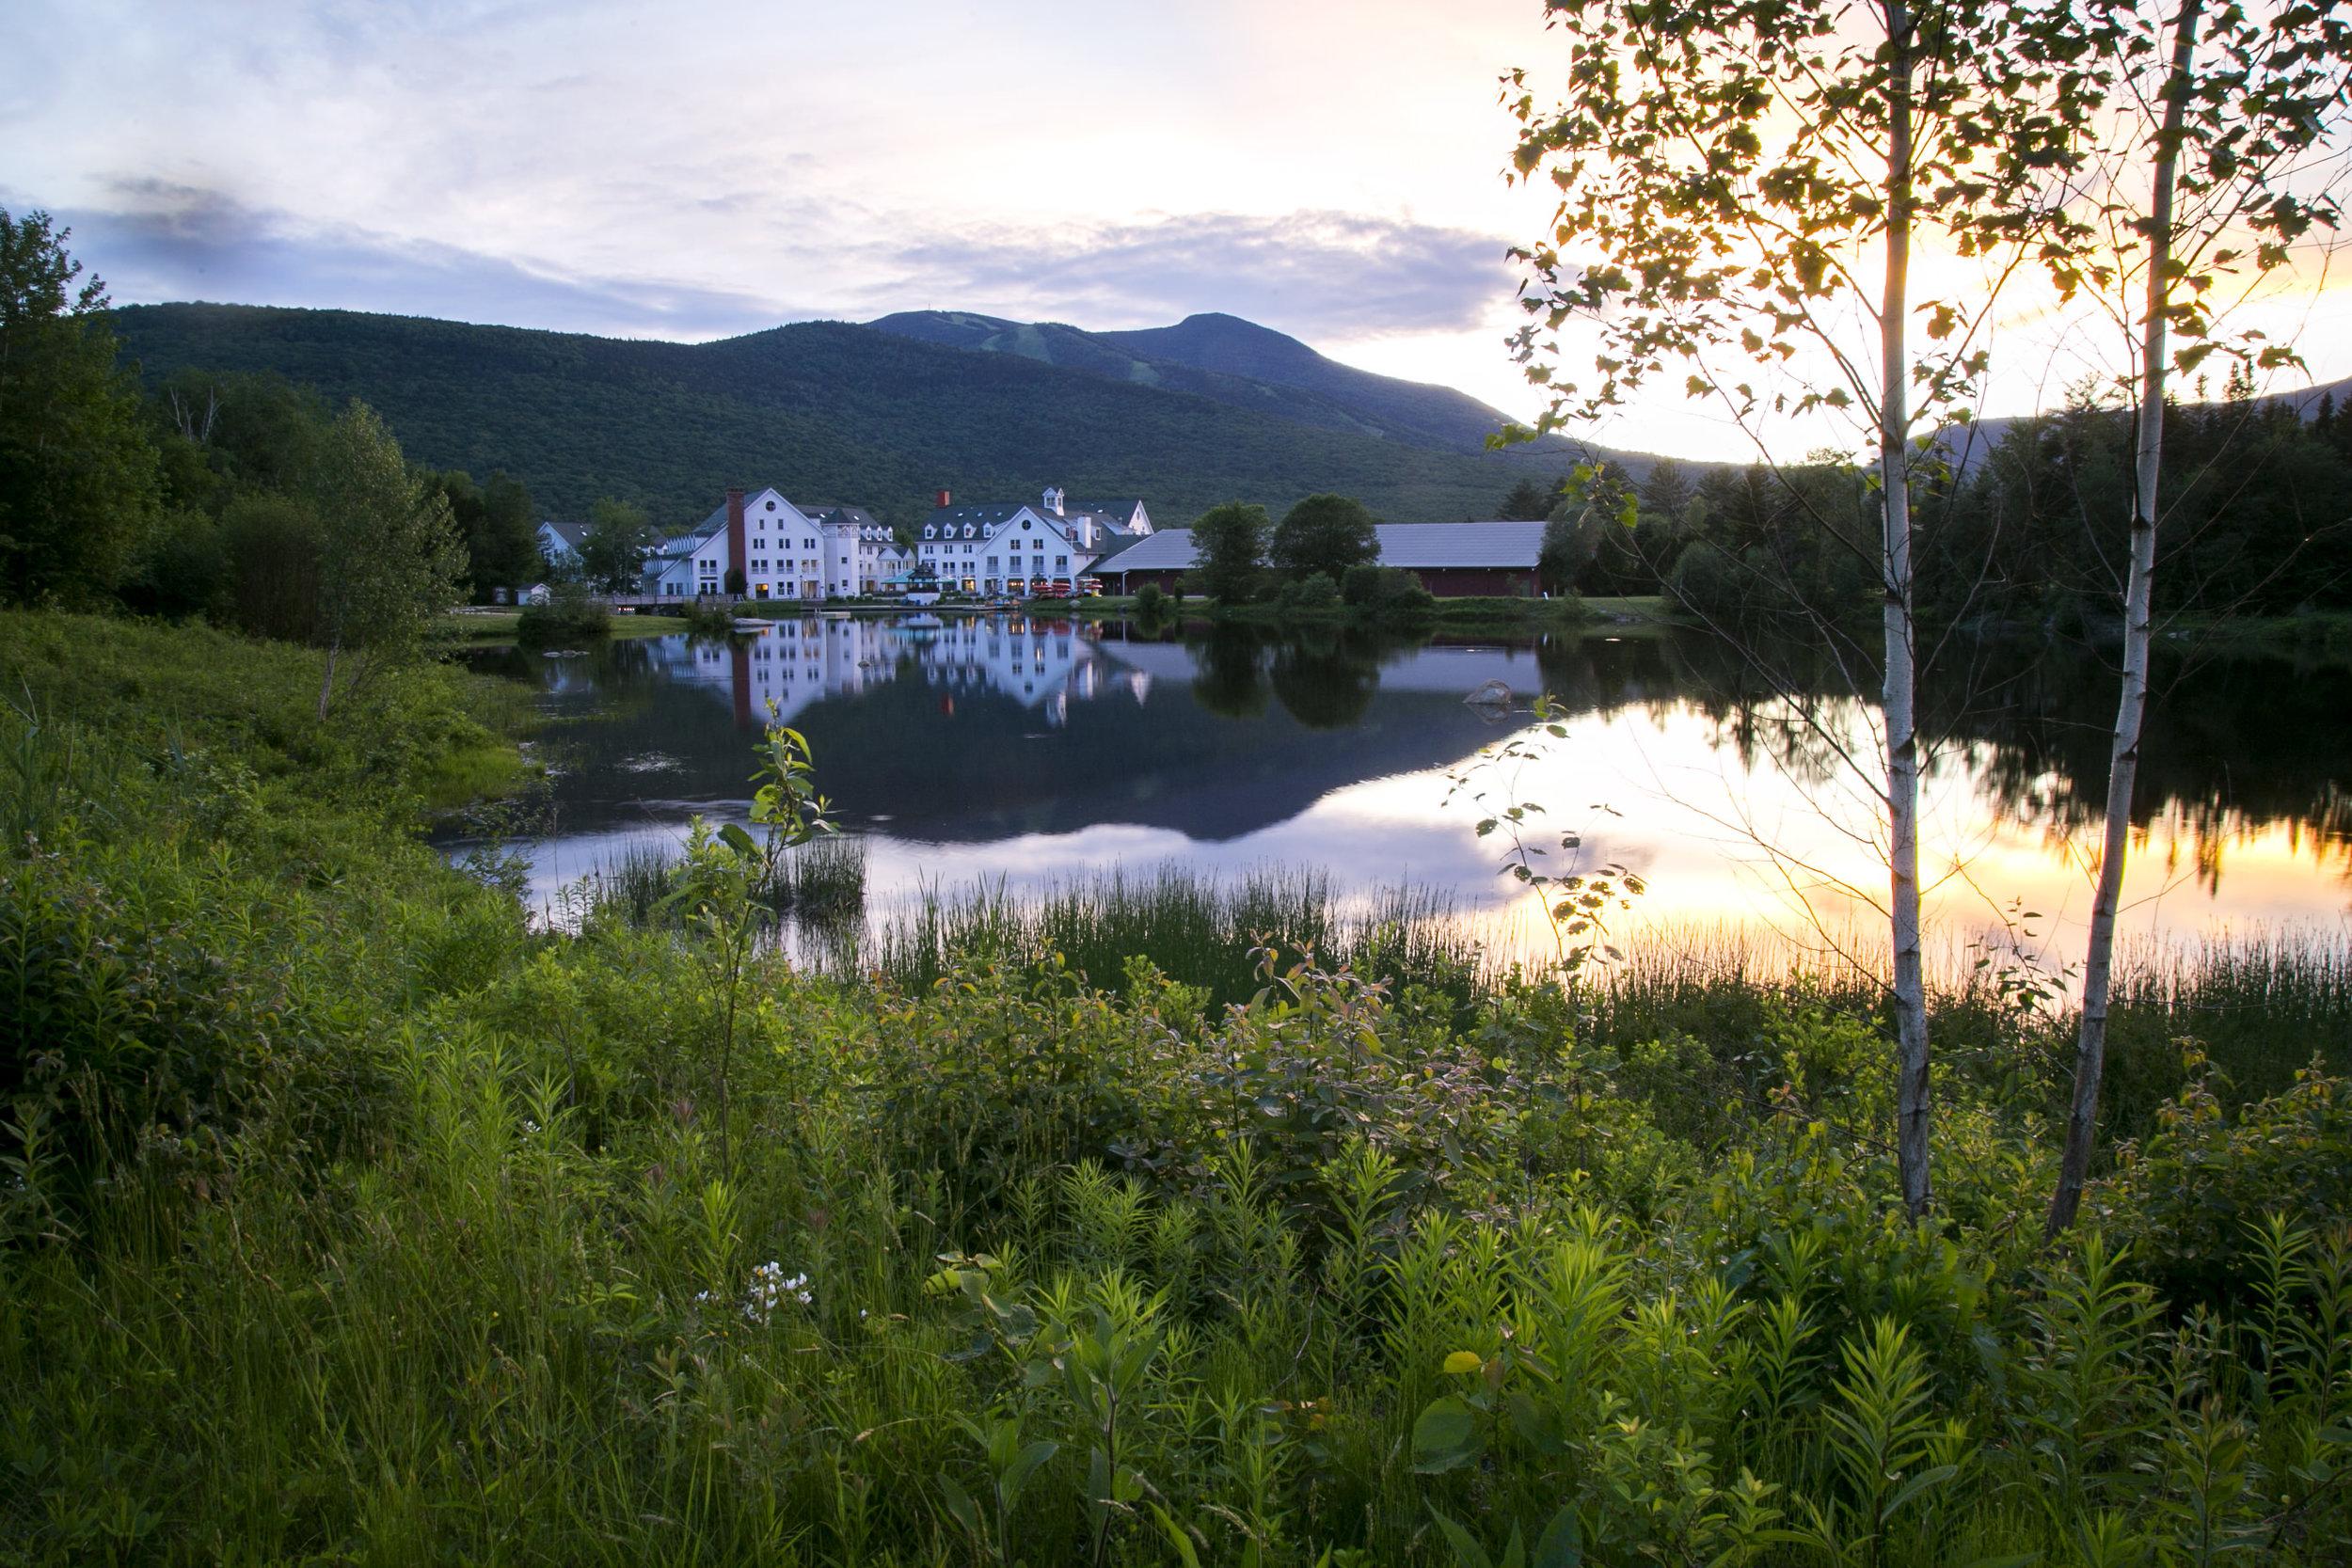 Waterville Valley Resort in Waterville Valley, NH June 2017